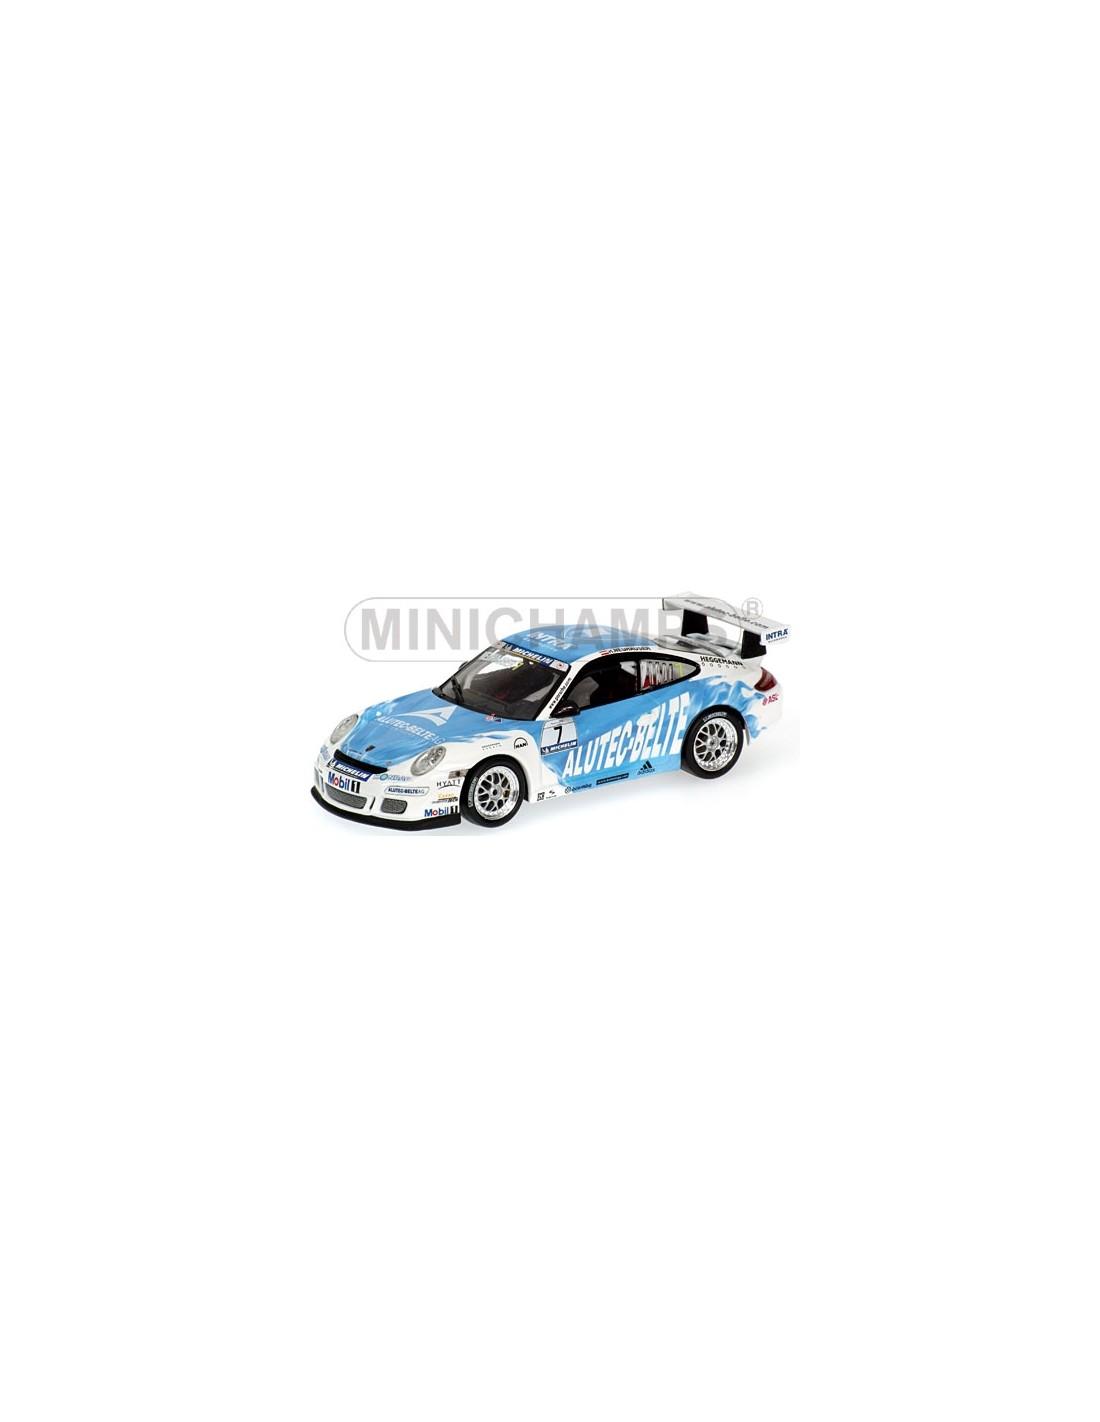 Supercup: MINICHAMPS PORSCHE 911 GT3